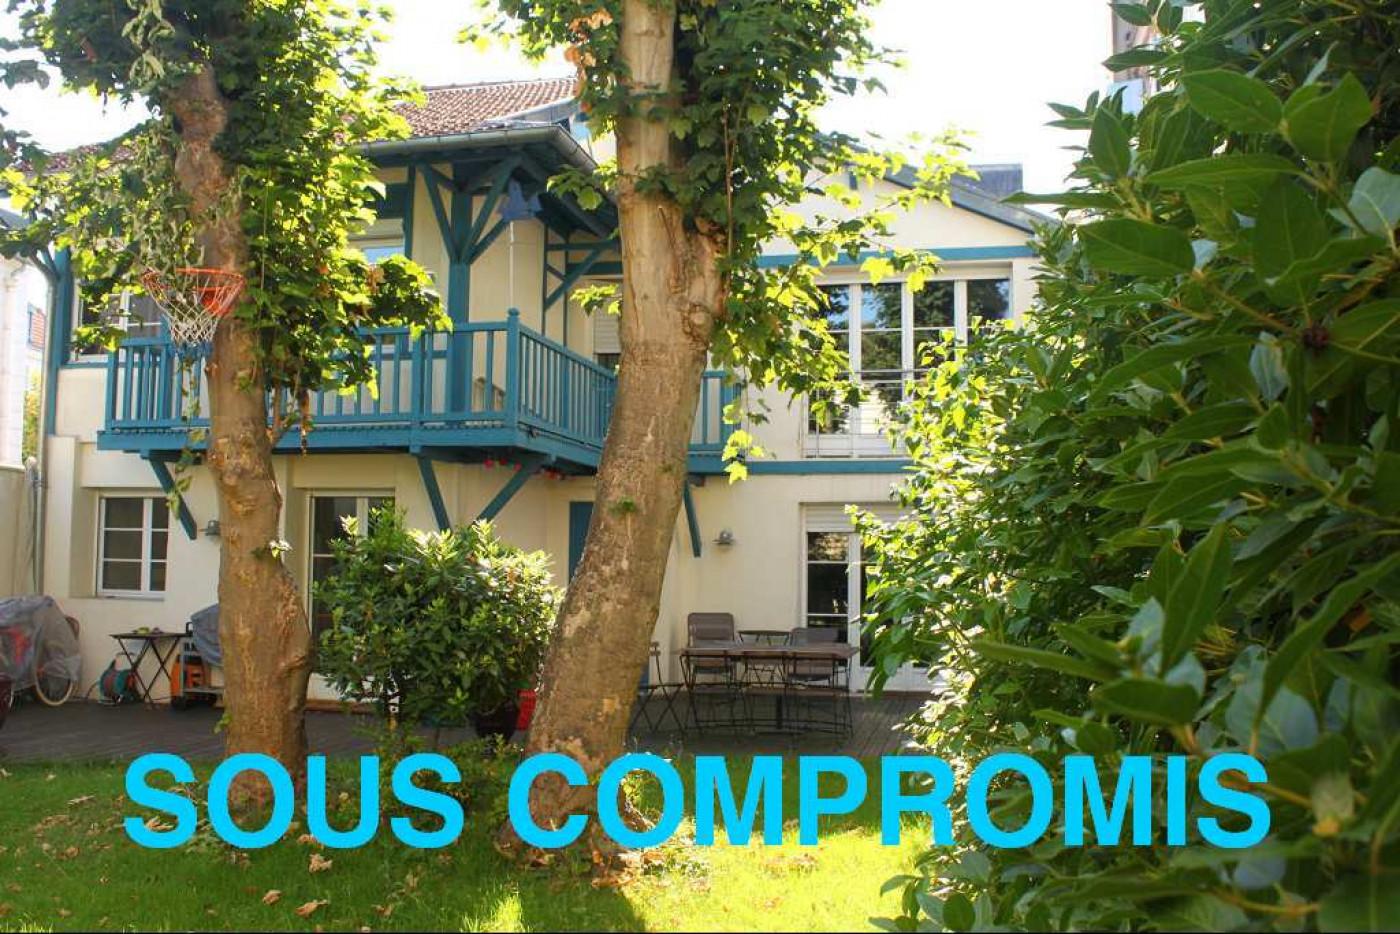 Home St Germain En Laye vente maison st germain en laye, 110m² 5 pièces 890 000€